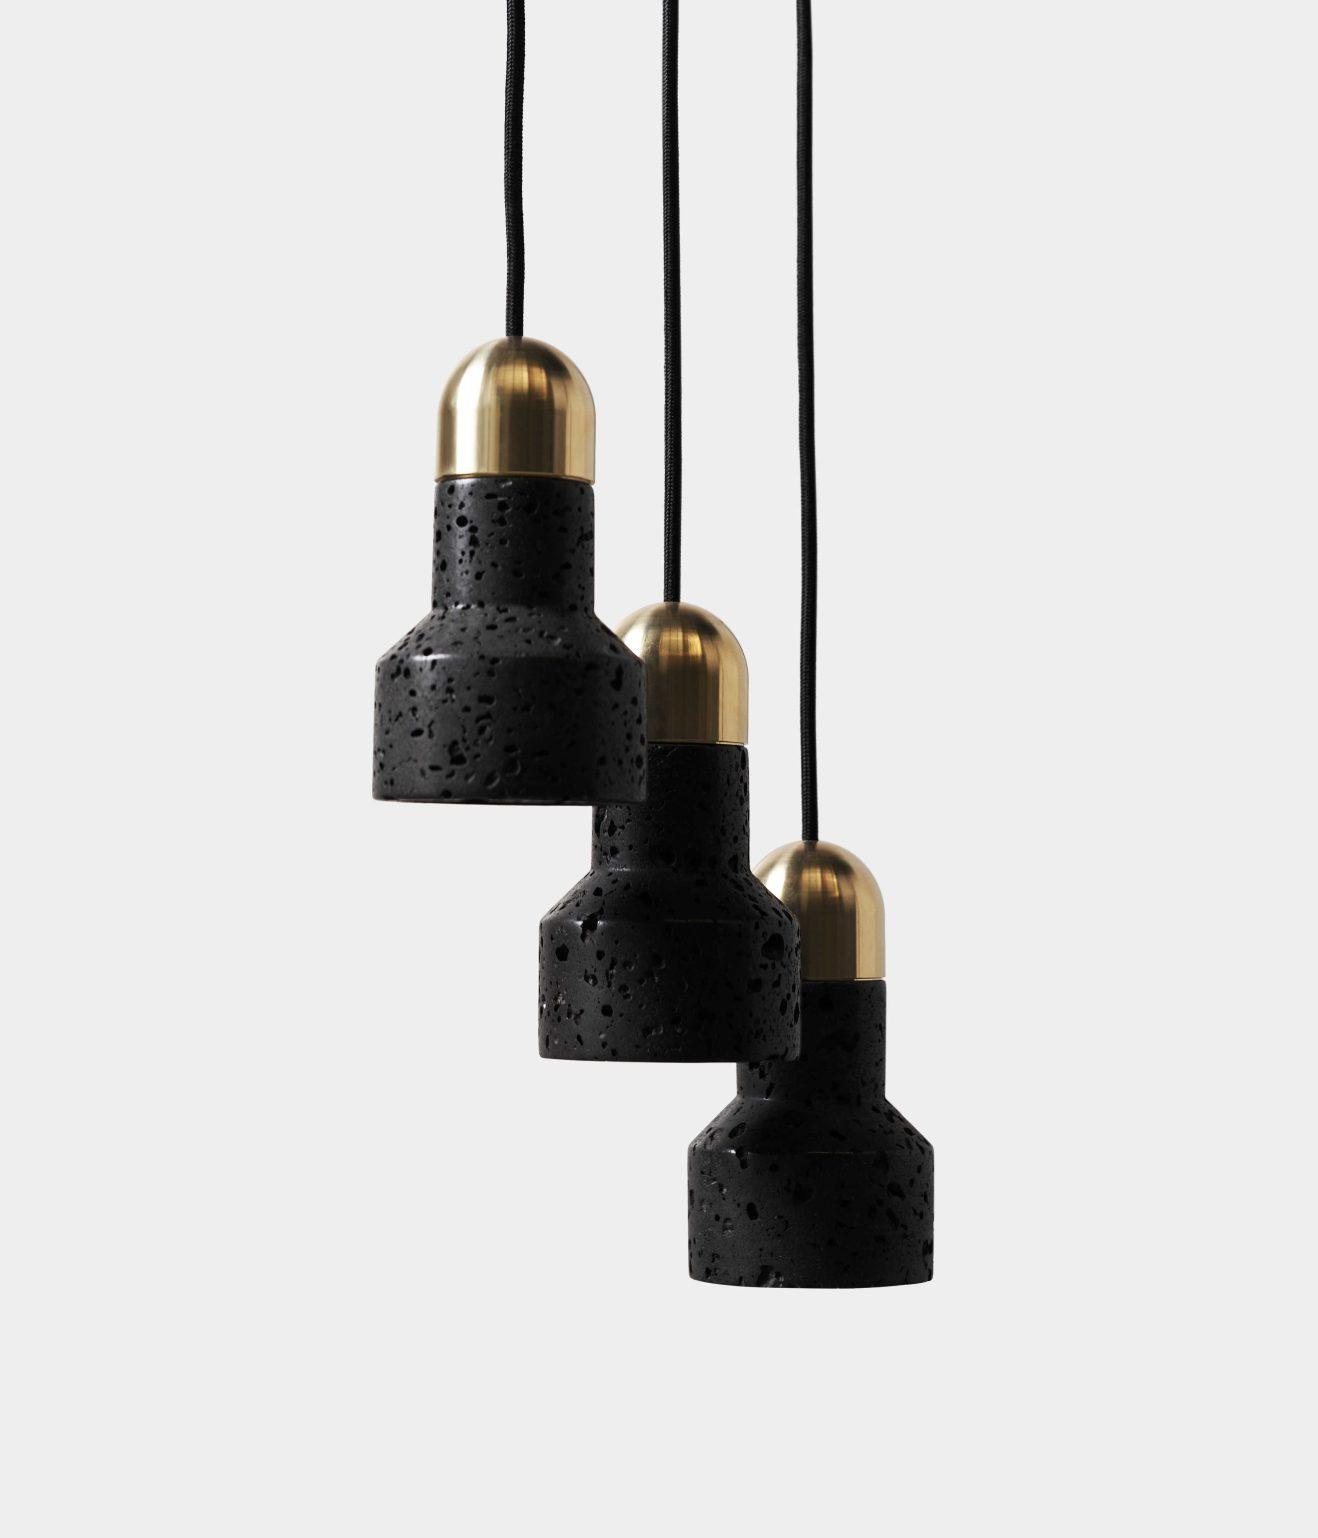 Buzao-Qie-Lava-Stone-Pendant-Lamp-Savannah-Bay-Gallery-5